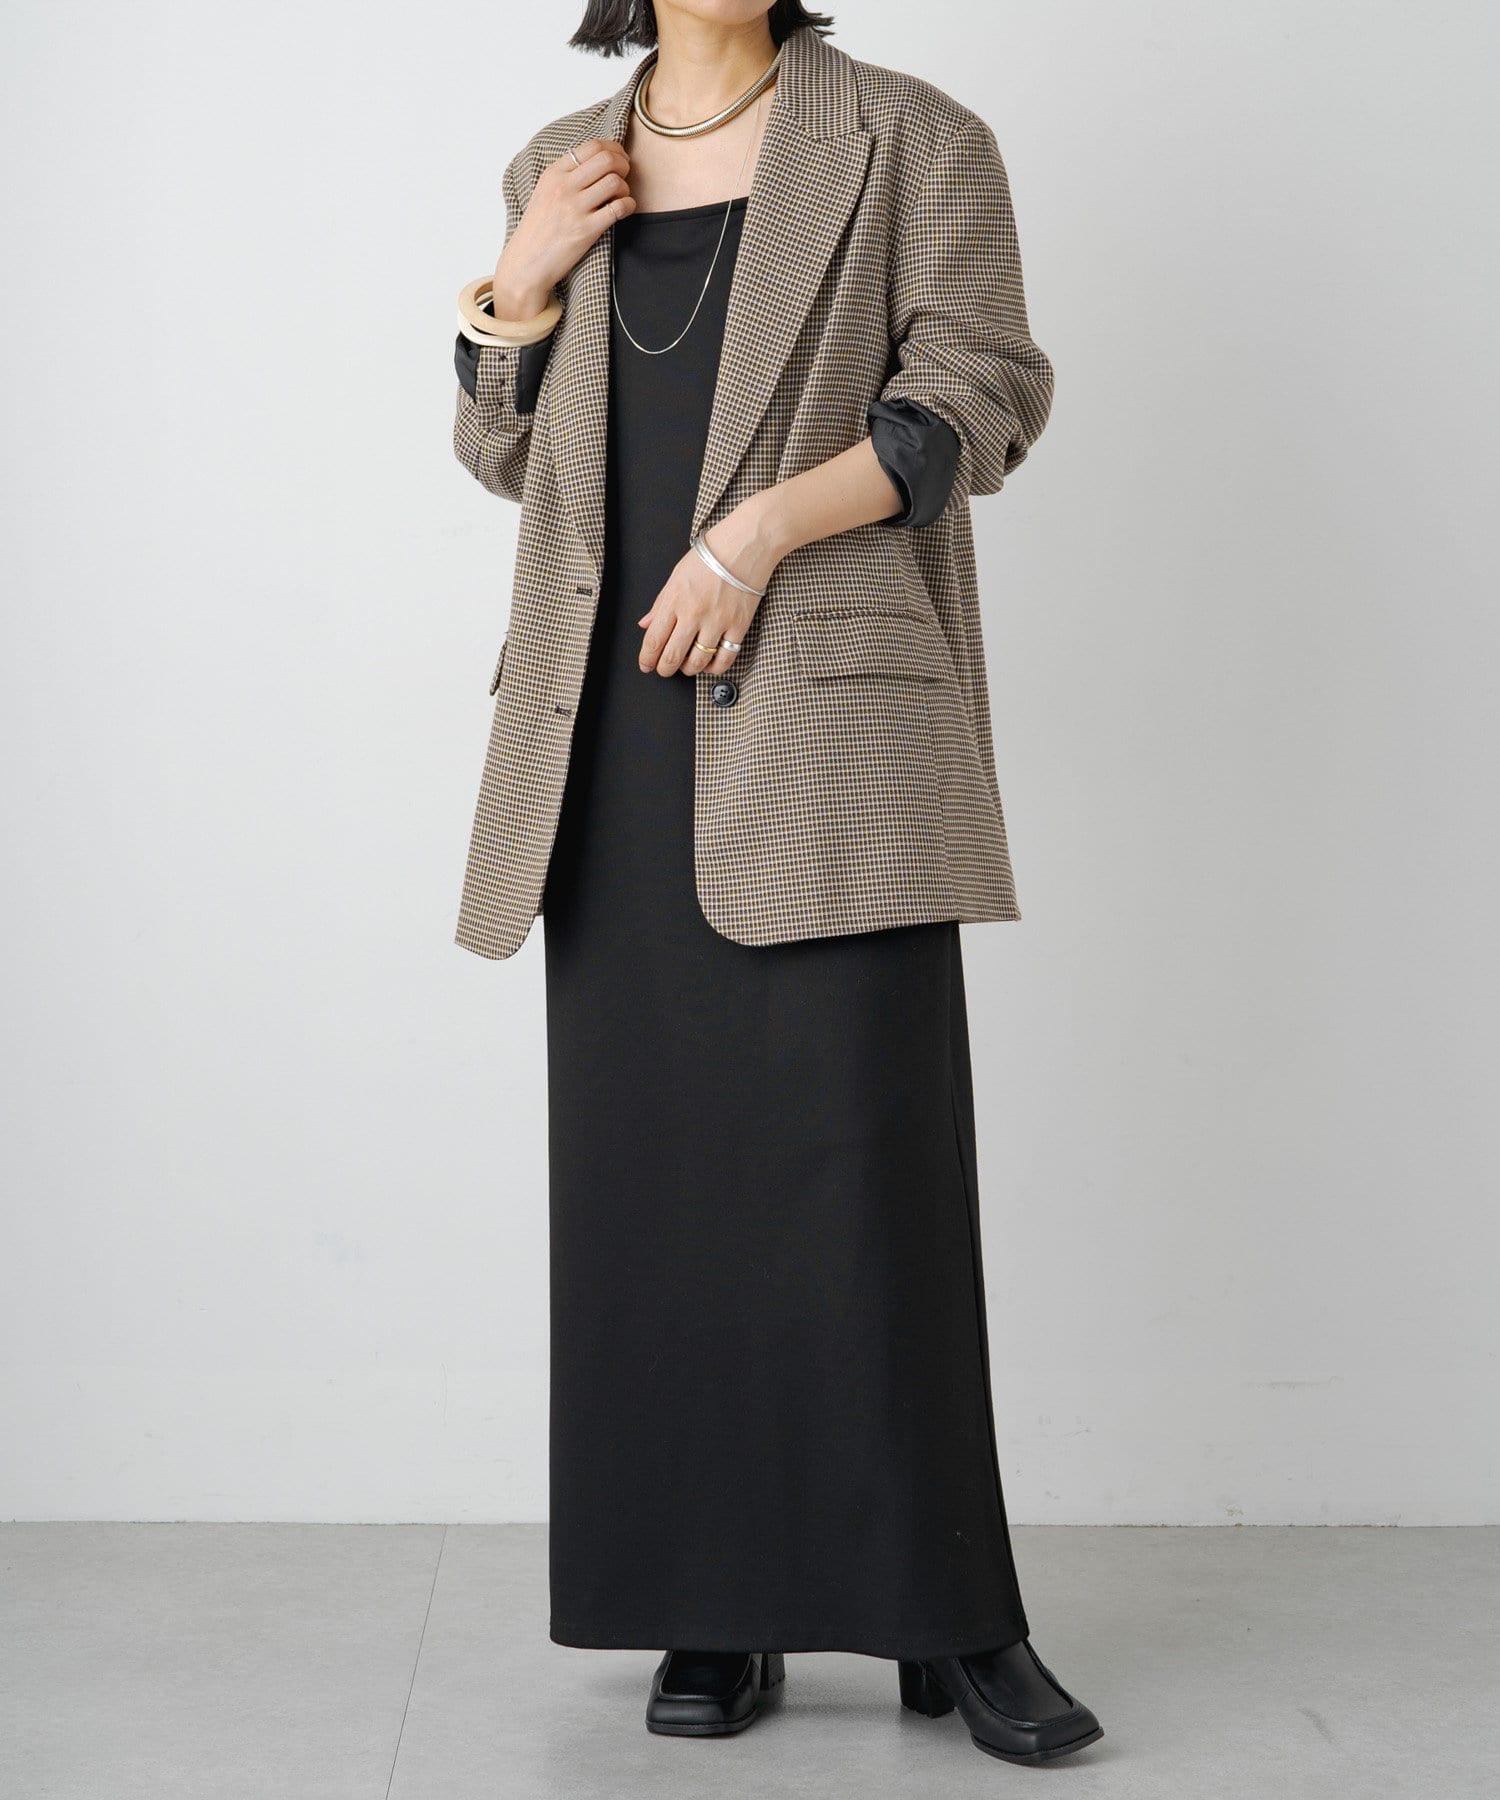 Omekashi(オメカシ) Önf(オンフ) キャミソールワンピース